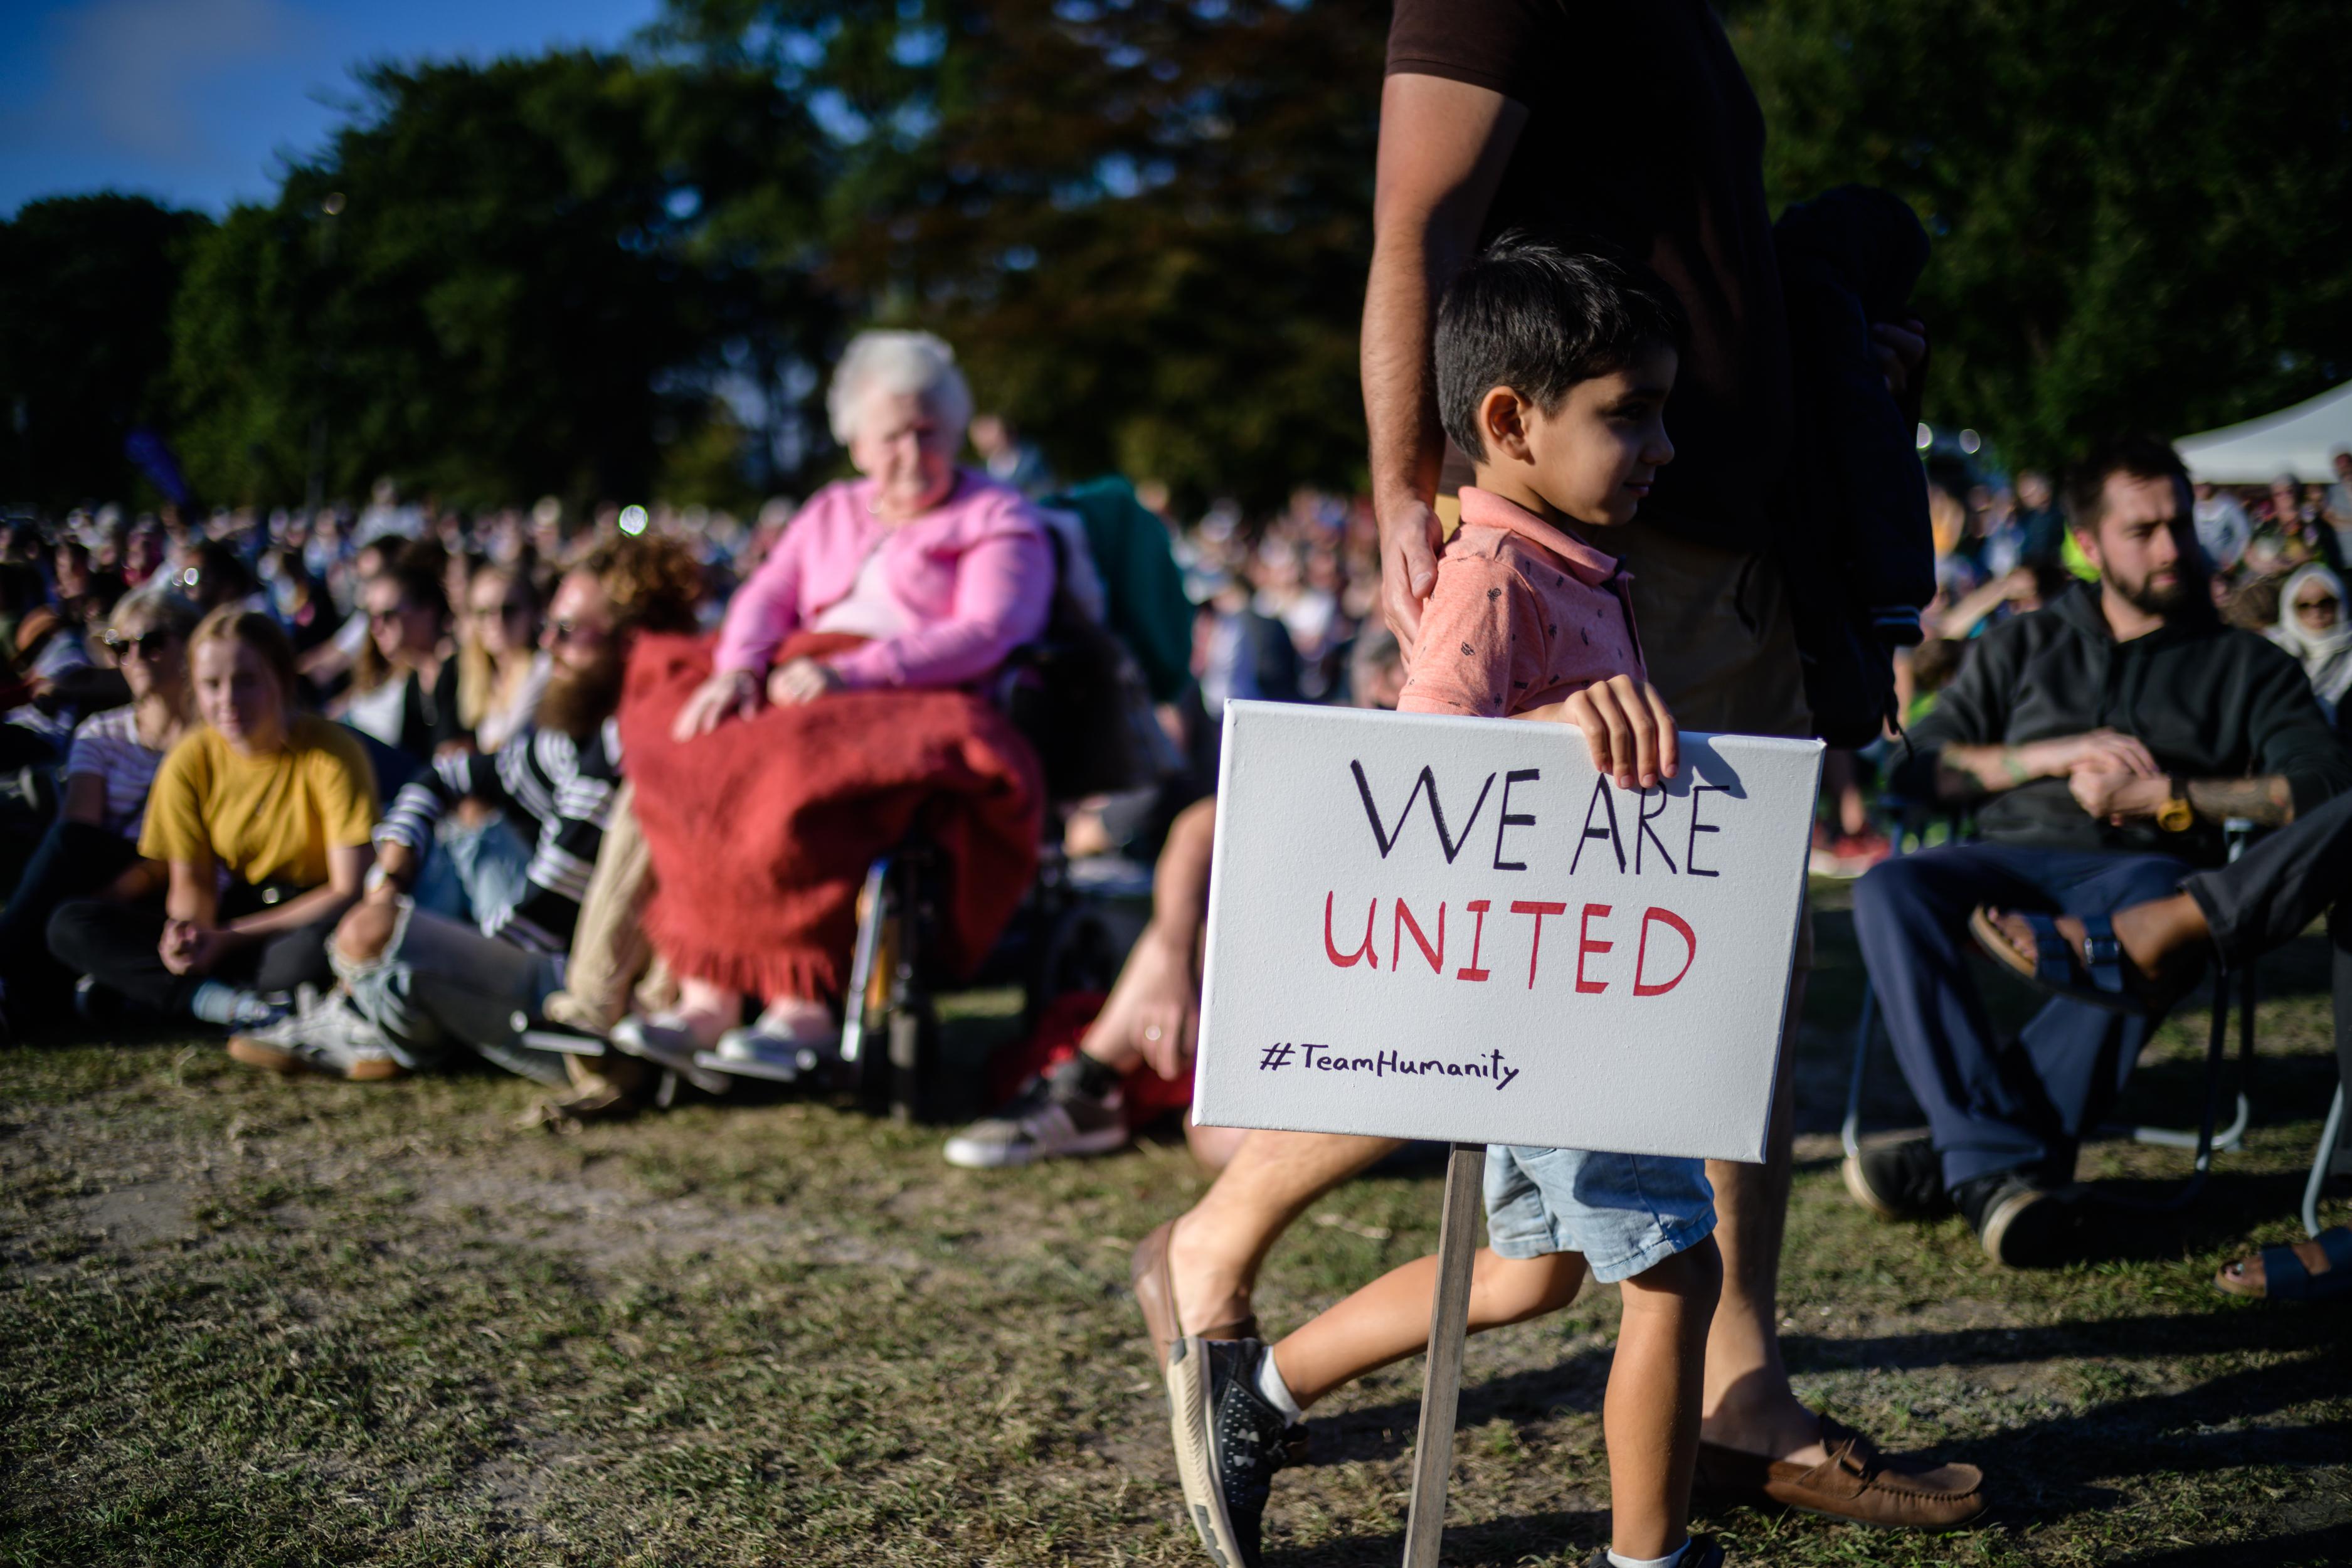 Duizenden mensen herdenken slachtoffers Christchurch